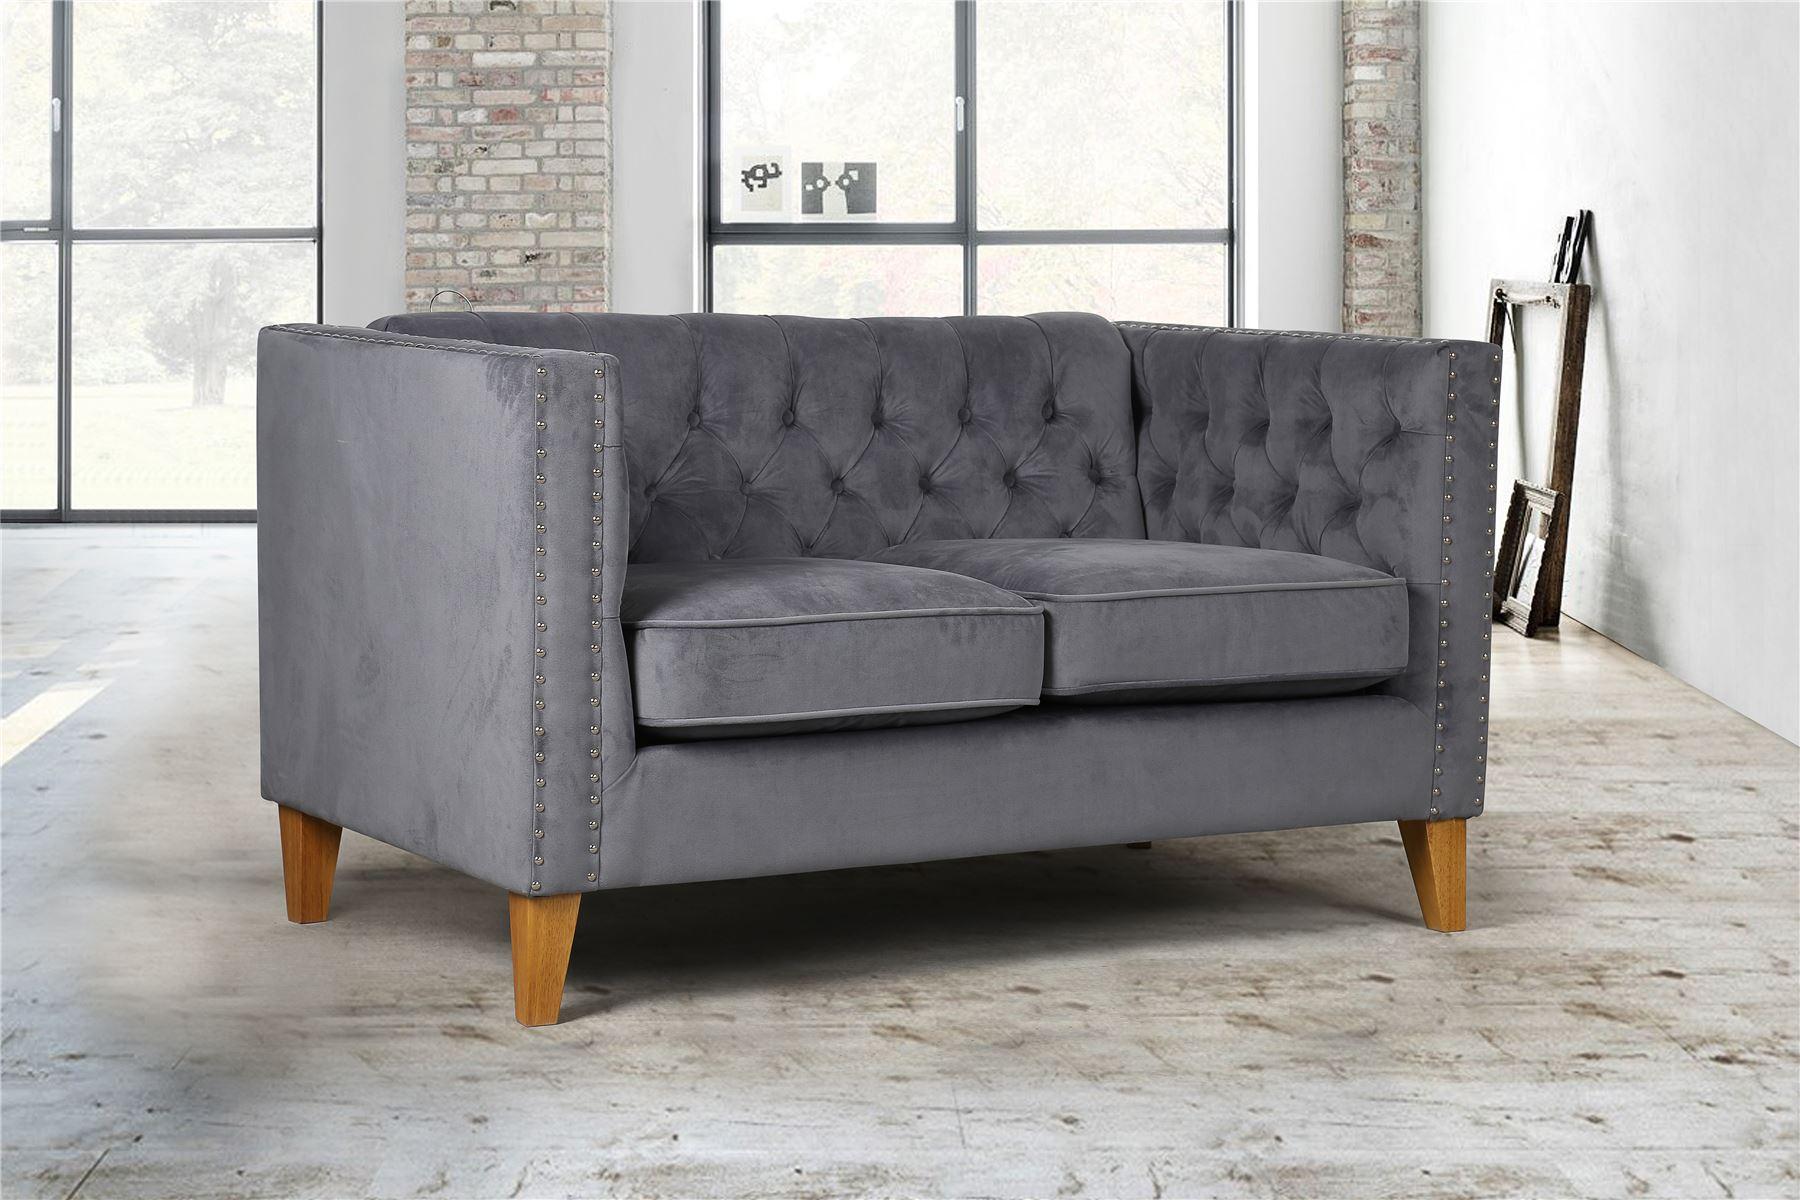 Birlea Florence Grey Velvet Medium Sofa Chair Button Back With Regard To Florence Medium Sofas (View 5 of 15)